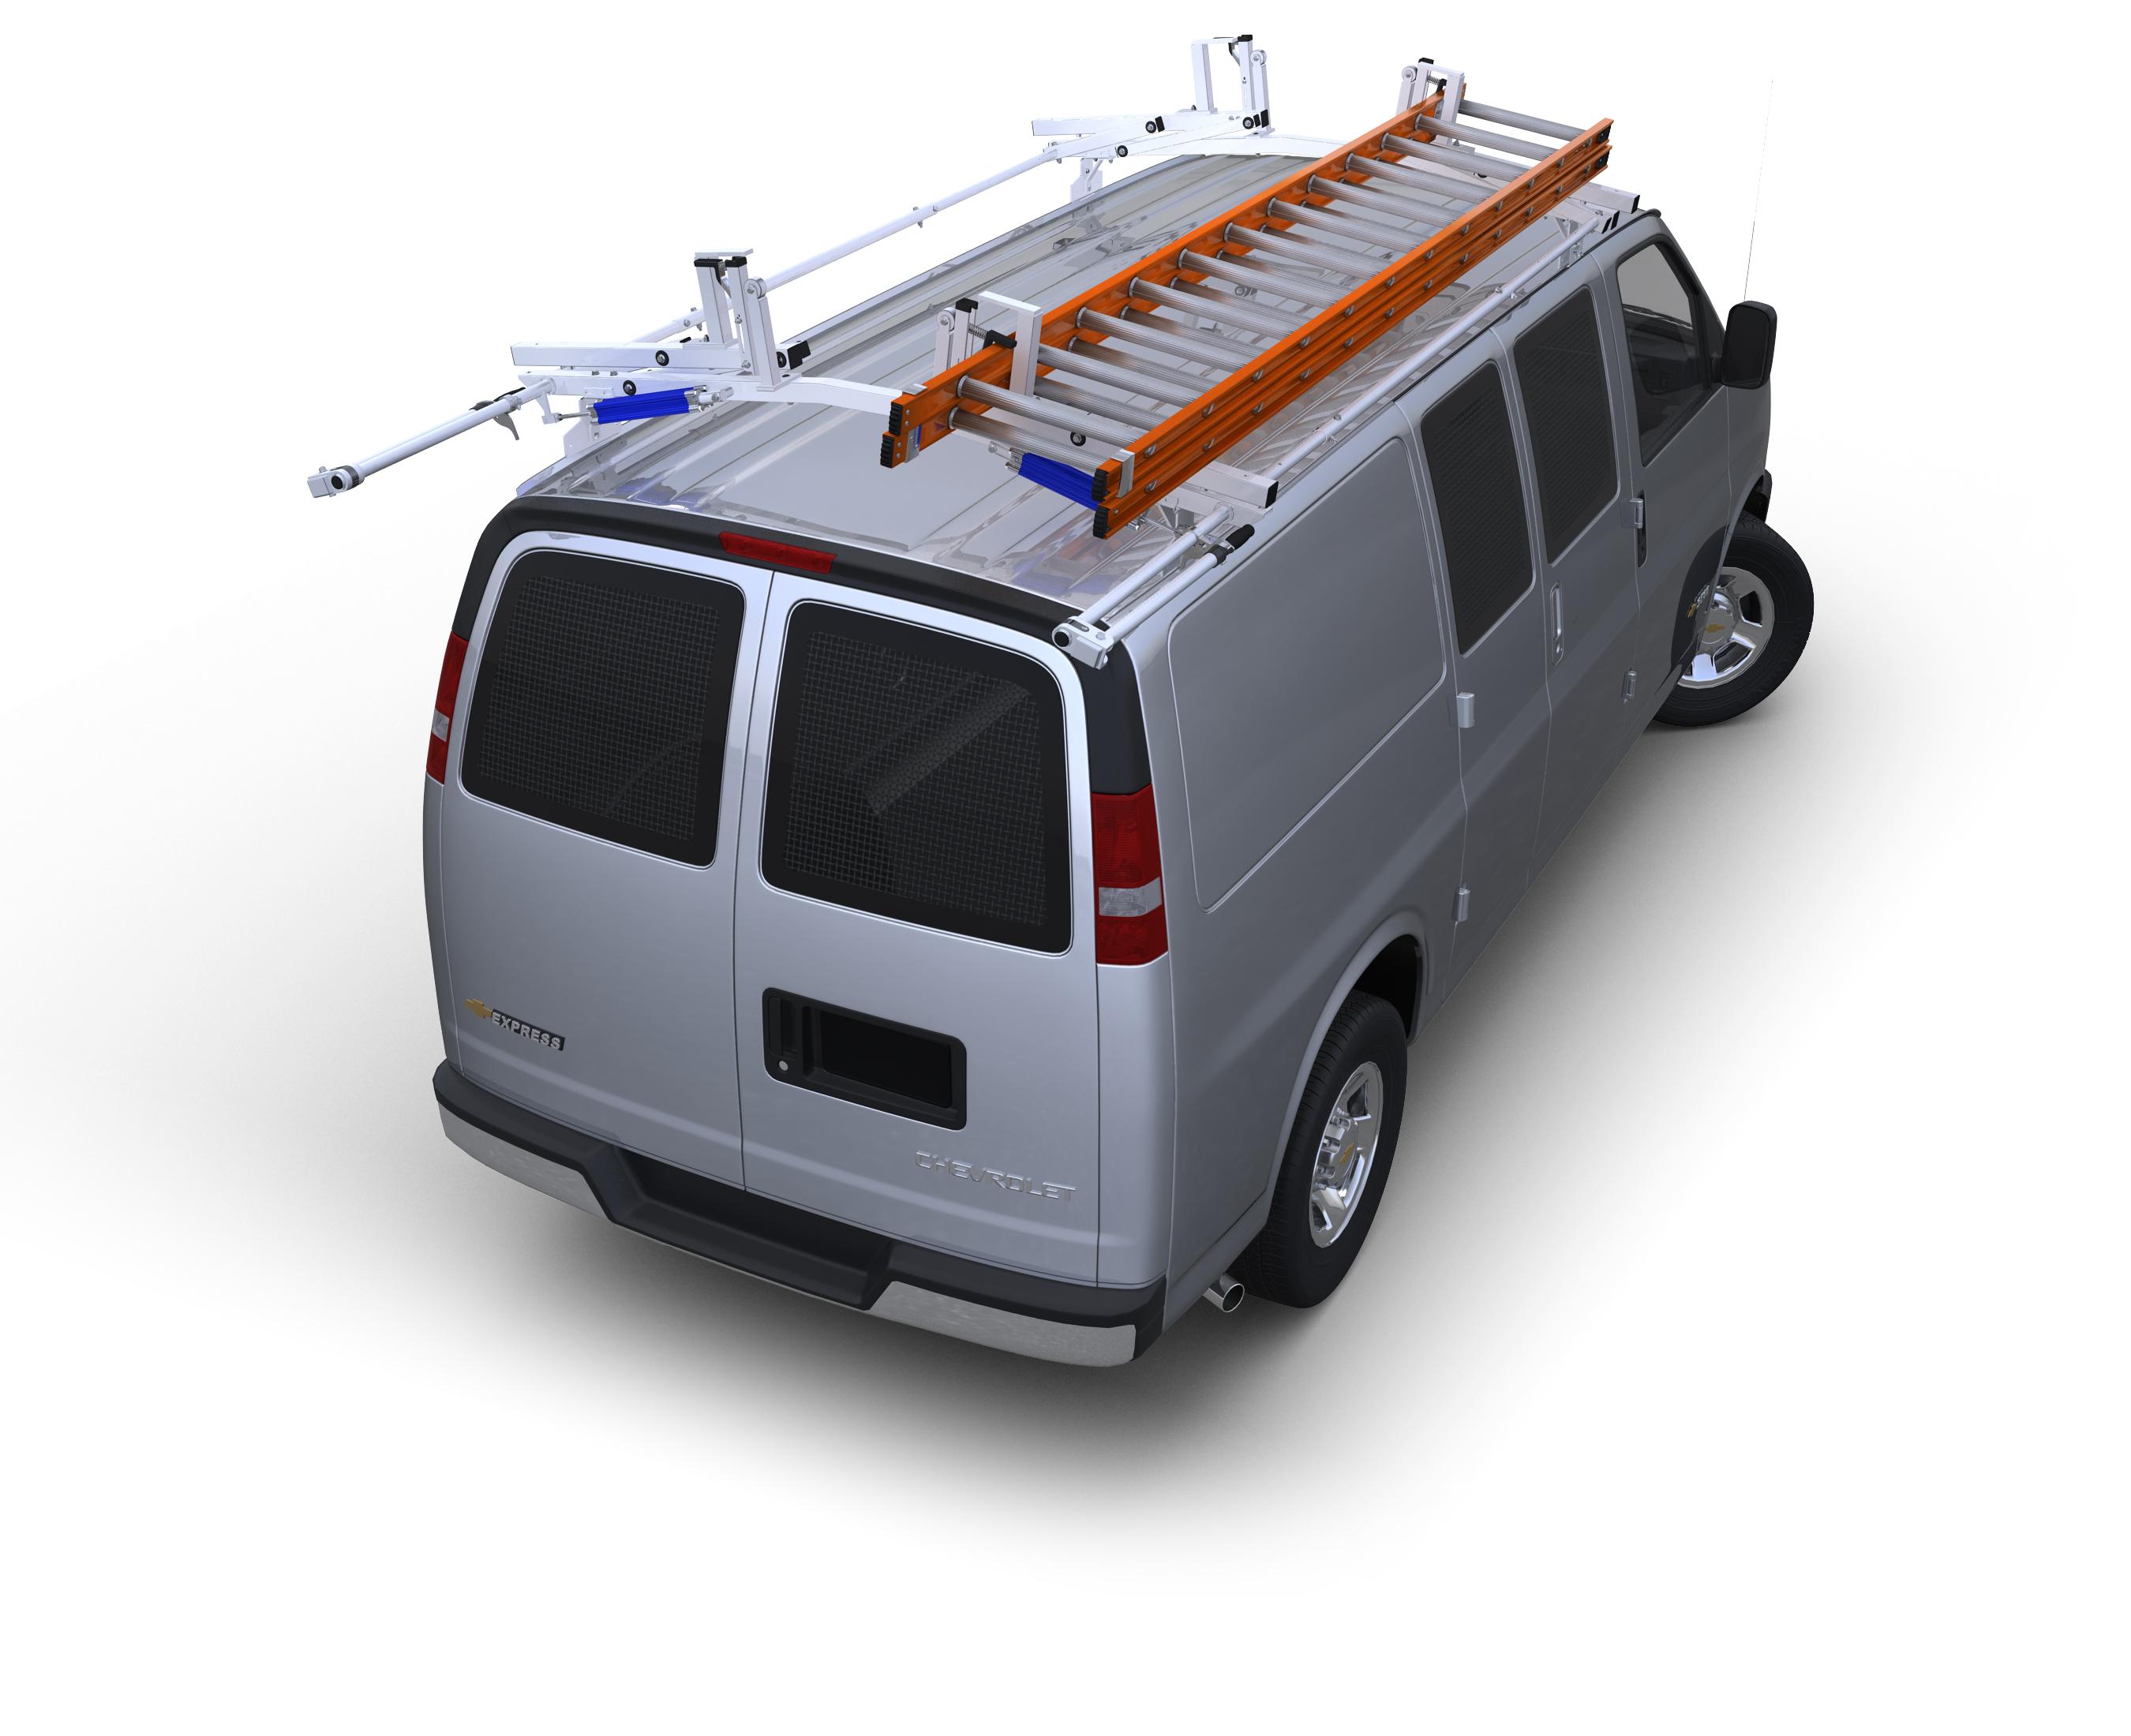 "Maximum Capacity 65"" High Aluminum Shelving w/ Closed Back & Door for Sprinter, ProMaster, Nissan NV High Roof & Ford Transit Medium & High Roof Vans"